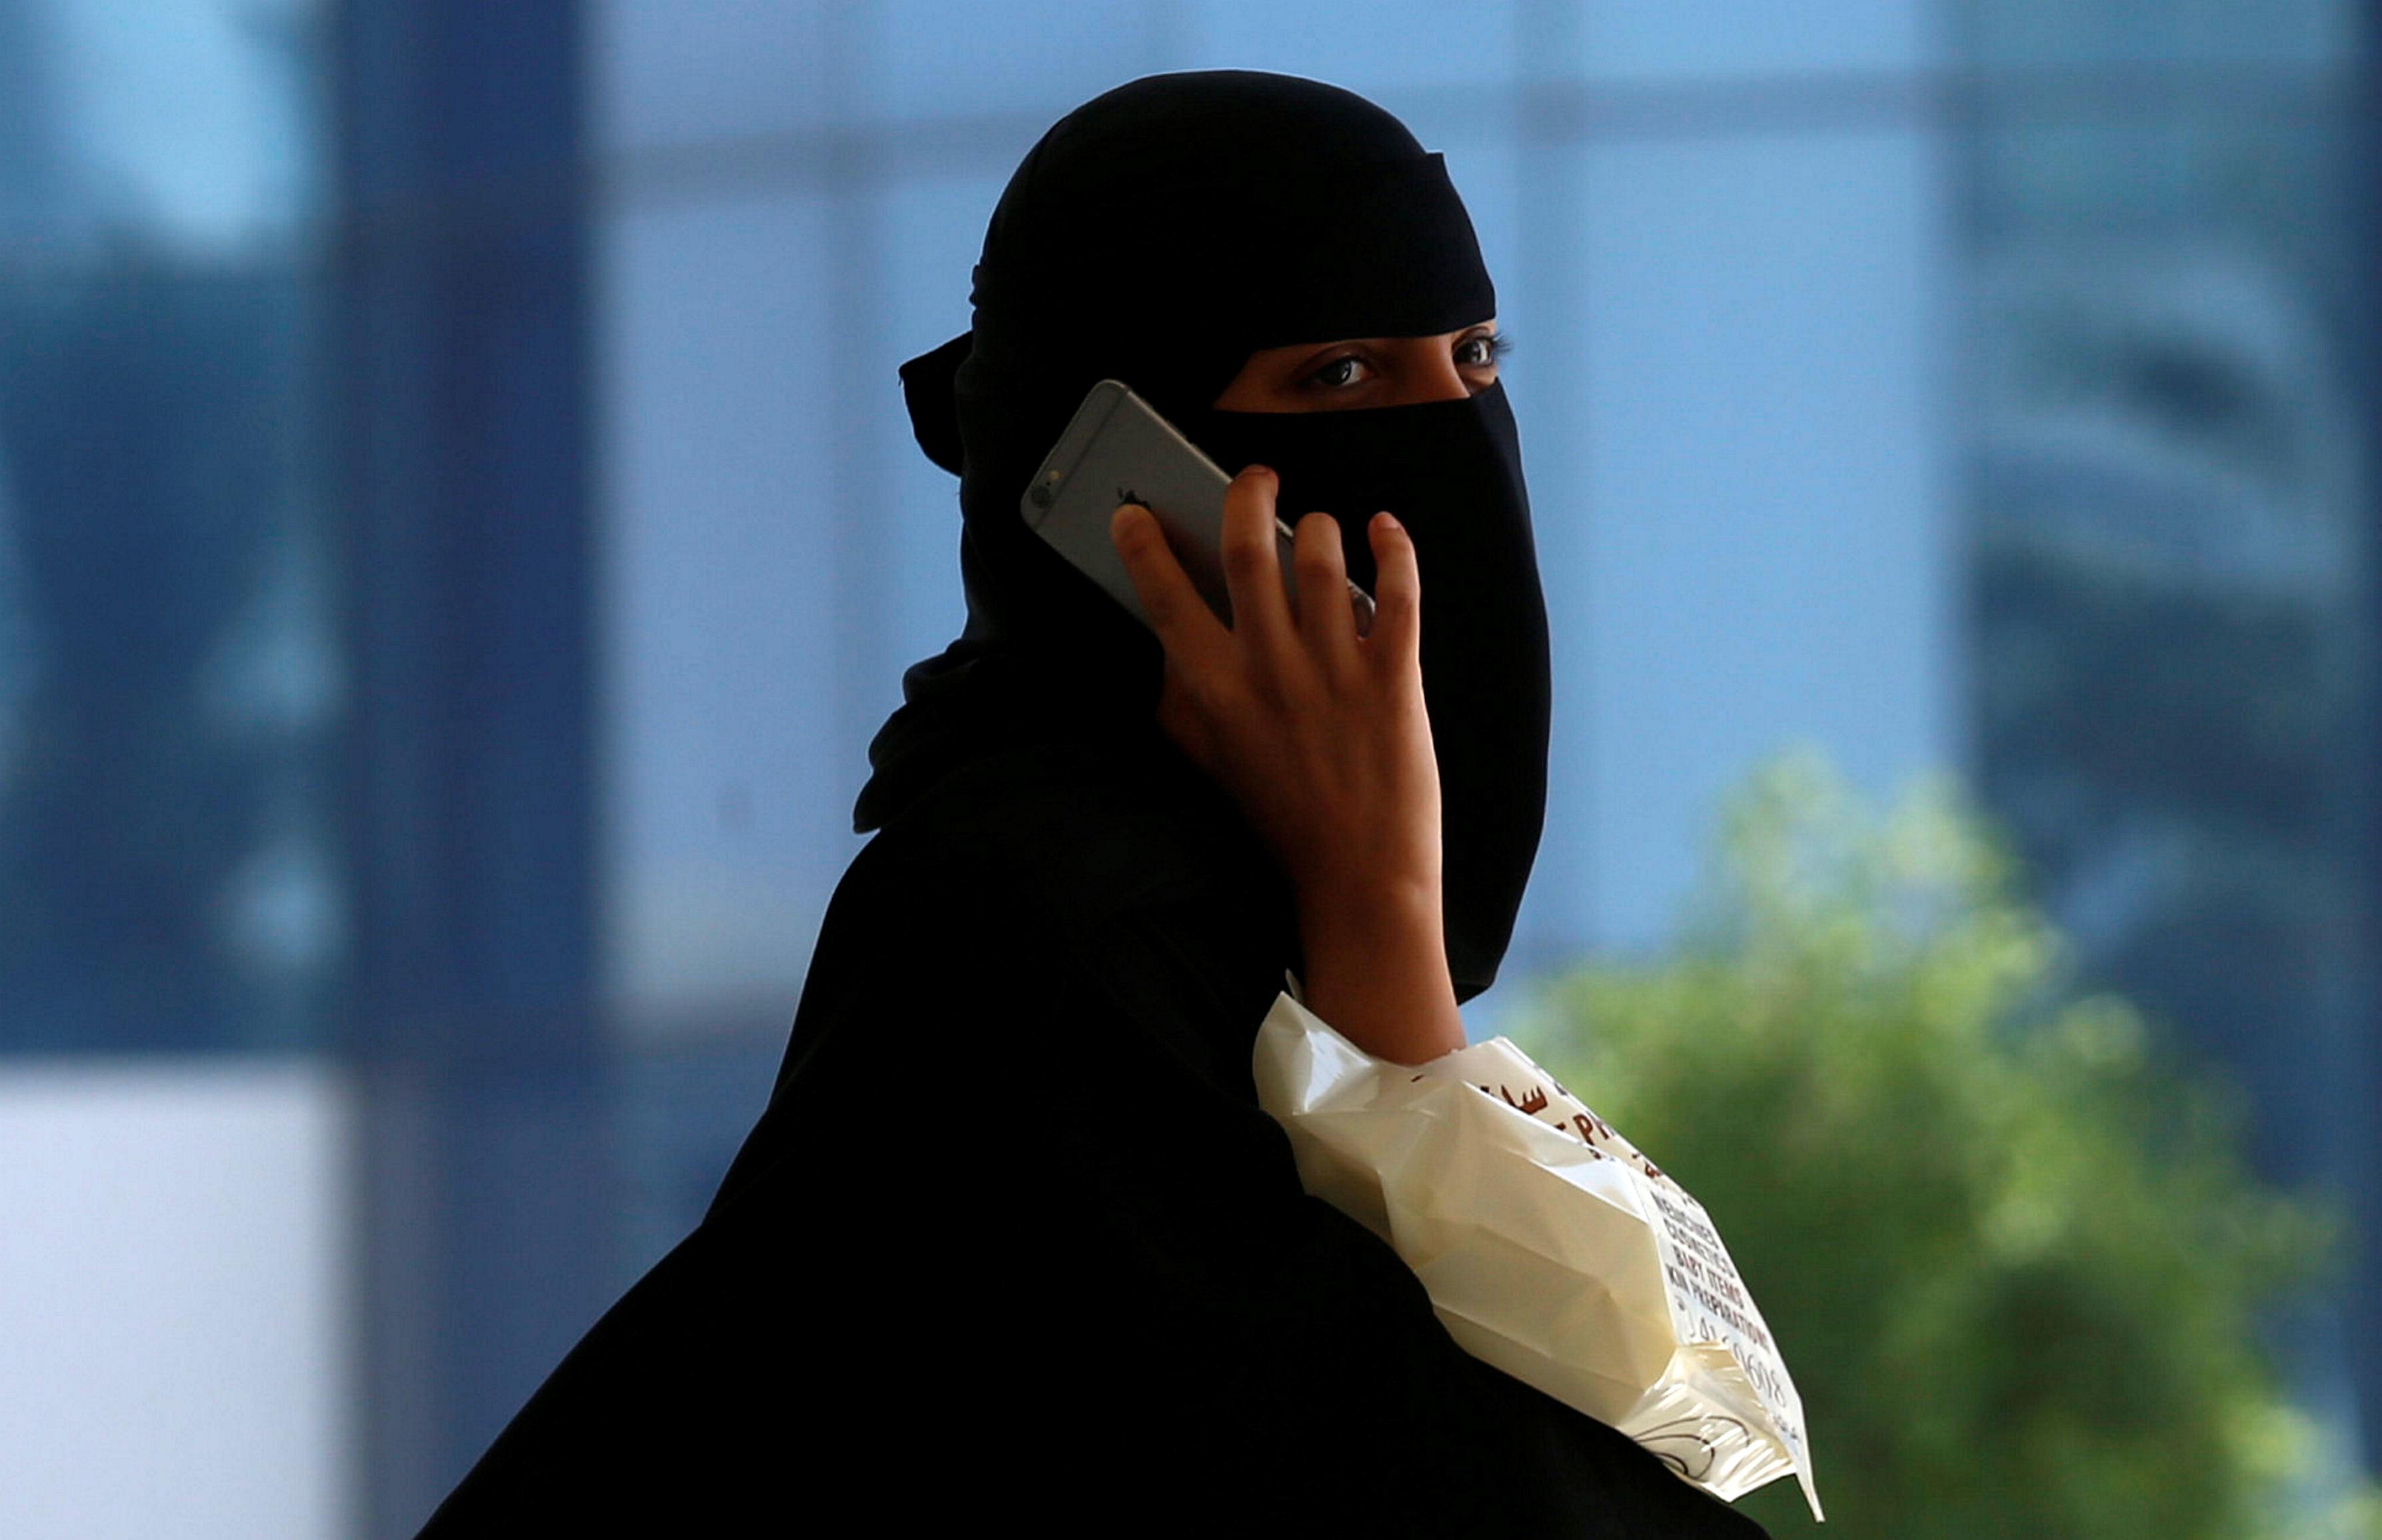 Riyadh - Saudi Arabia Lifts Travel Restrictions On Women